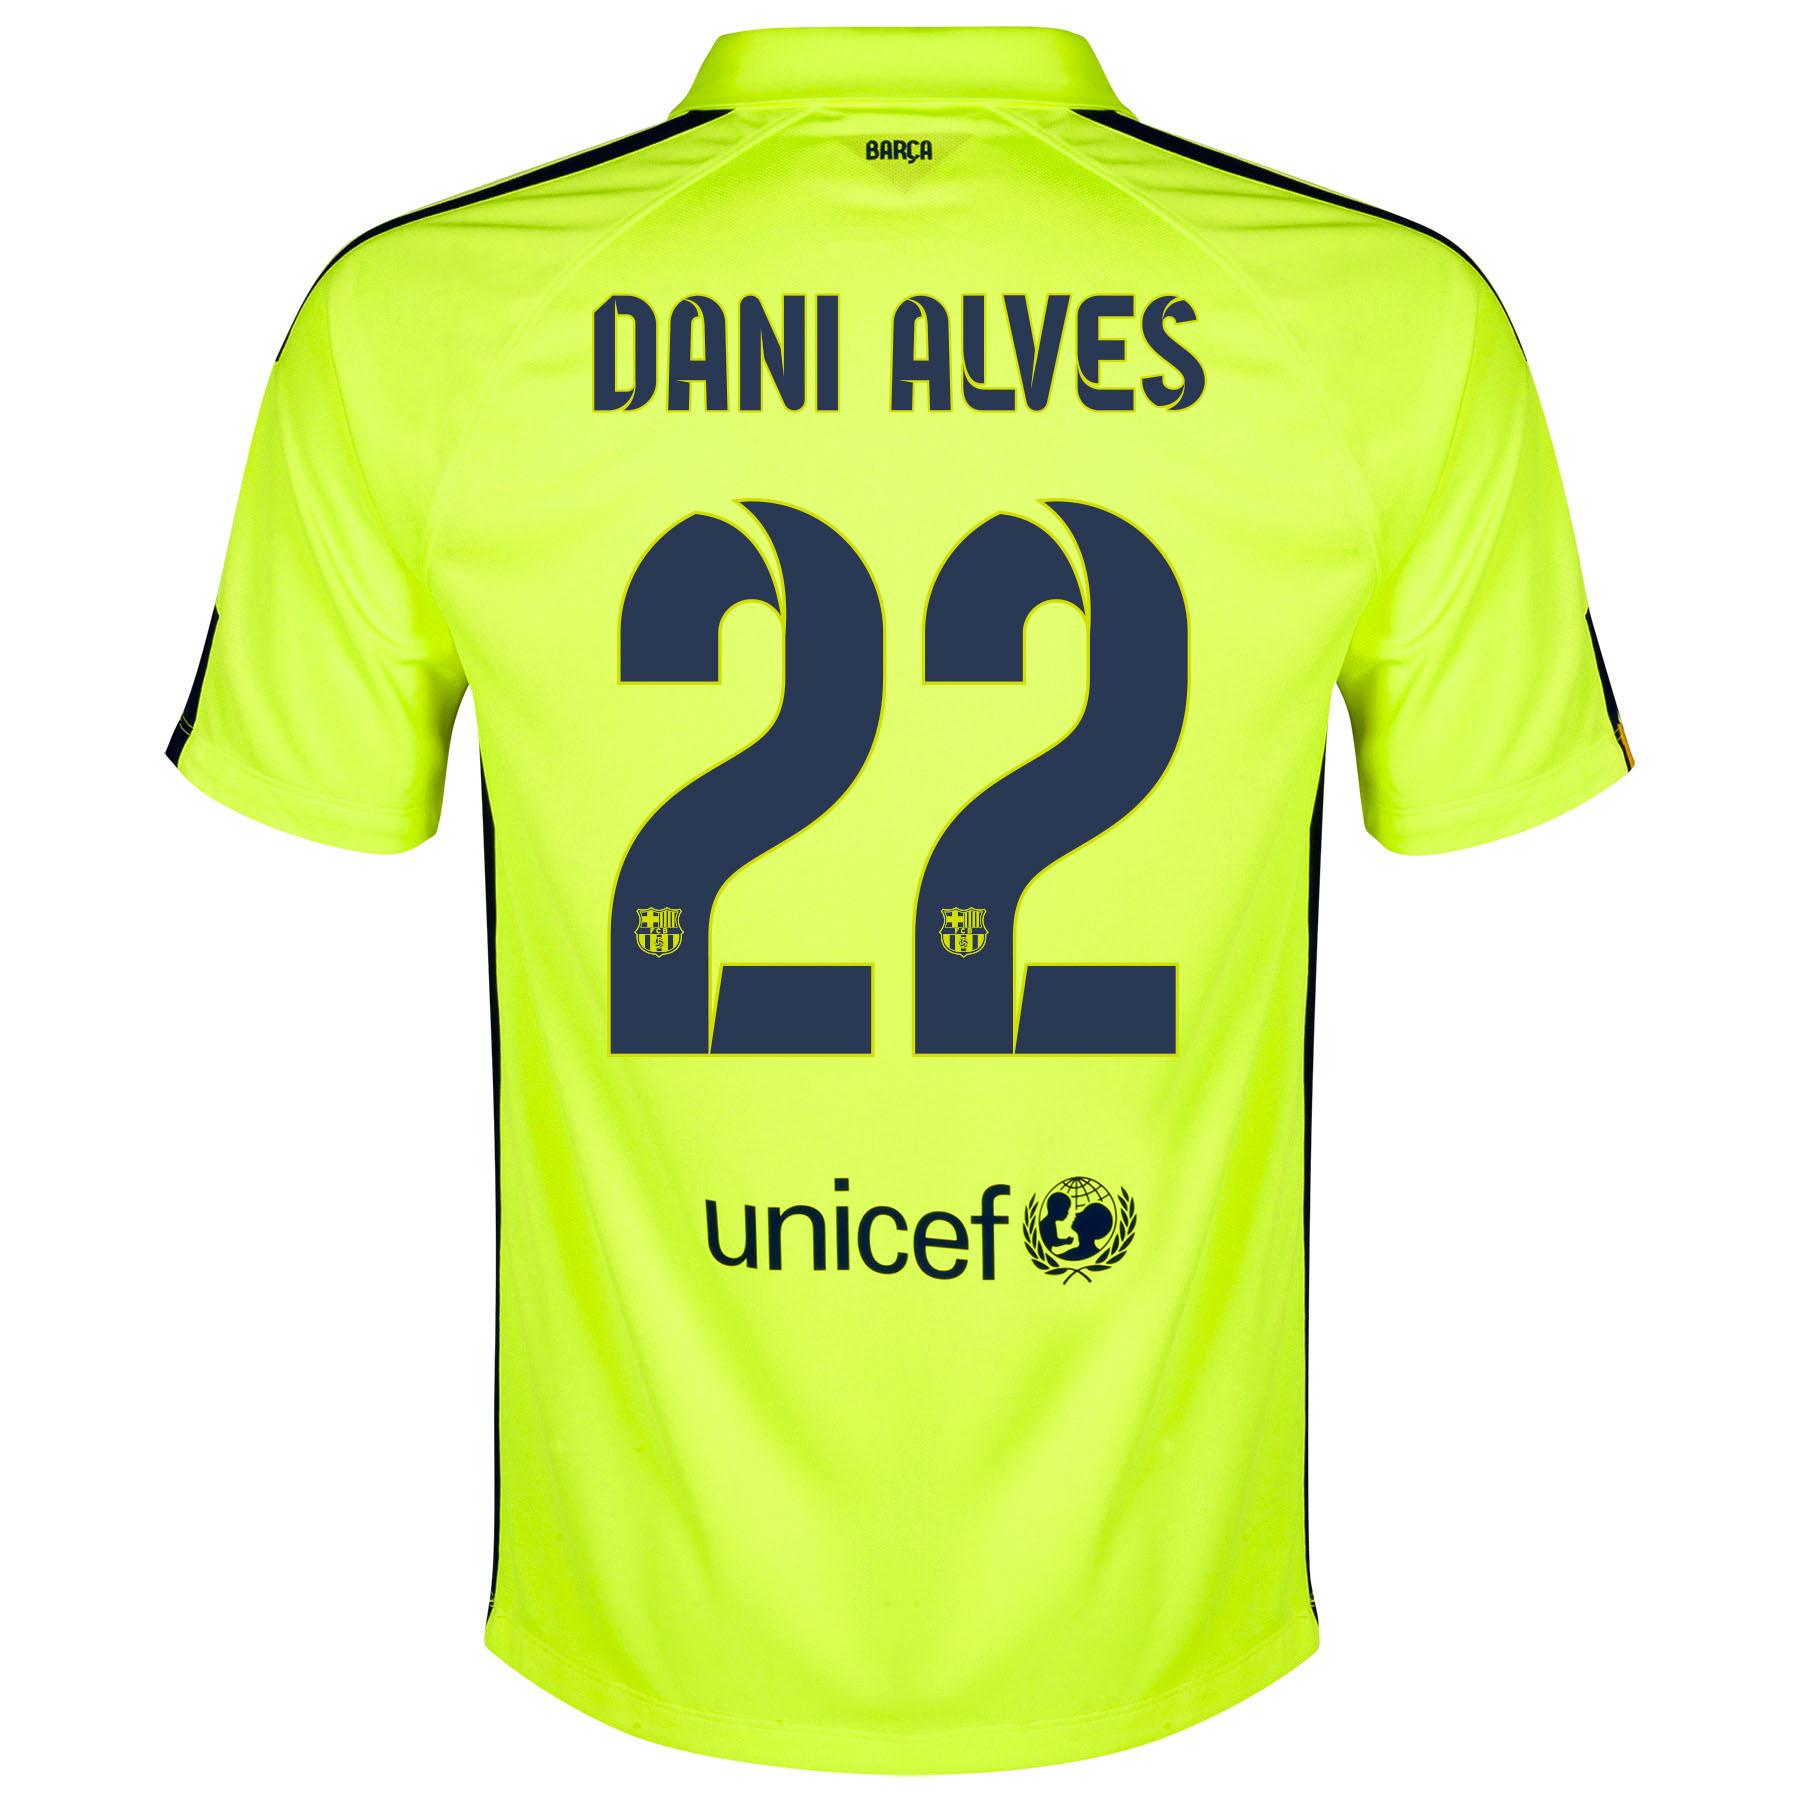 Barcelona Third Shirt 2014/15 Yellow with Dani Alves 22 printing